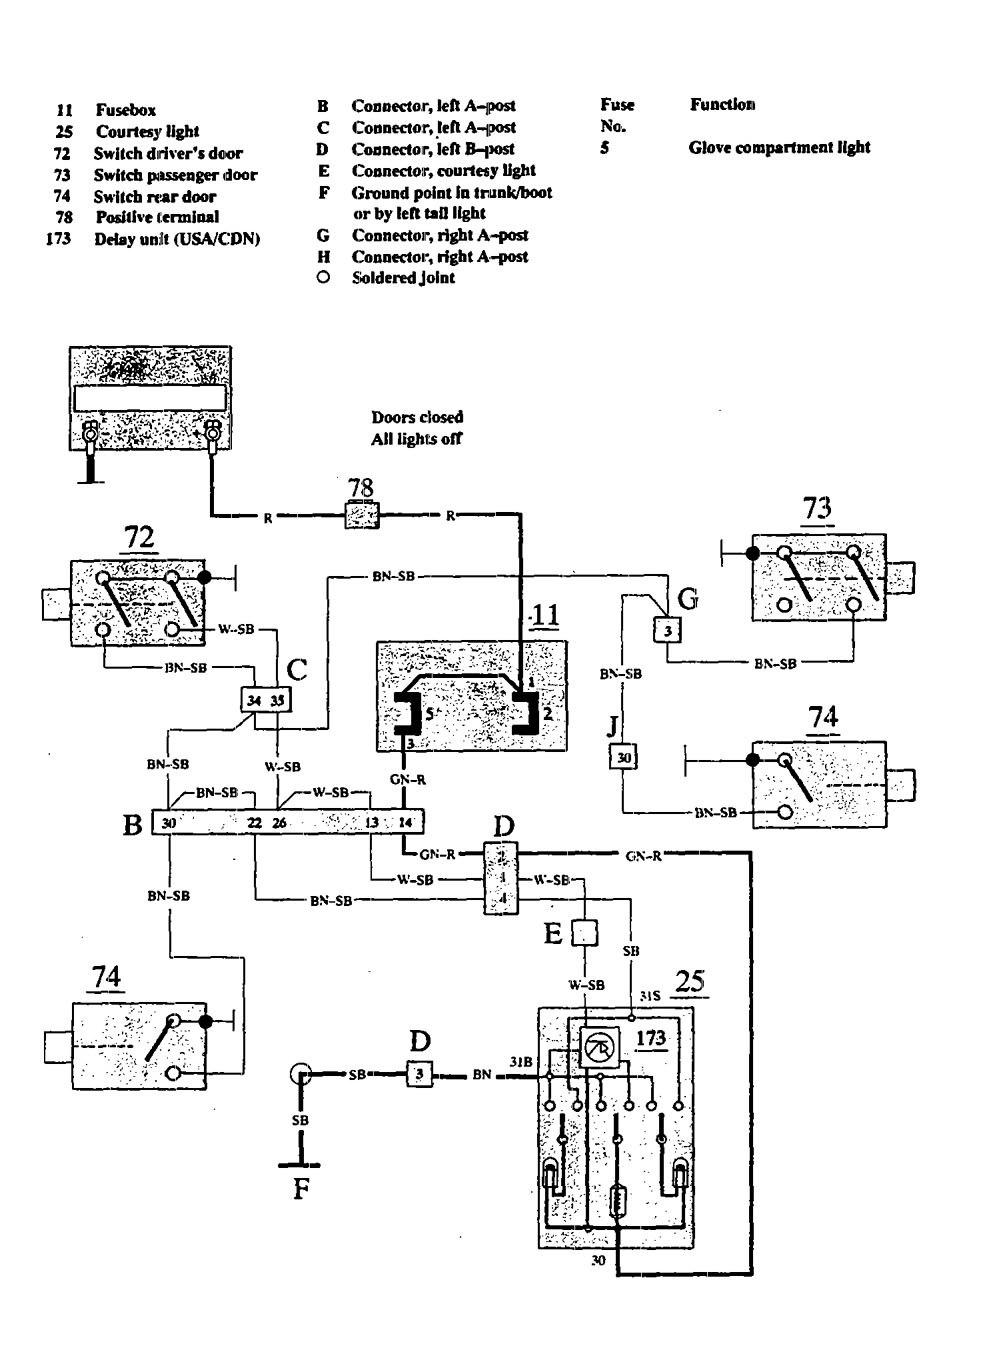 1992 Volvo 940 Gla C Wiring Diagram Detailed Schematic Diagrams 1987 240 1995 List Of Circuit U2022 1991